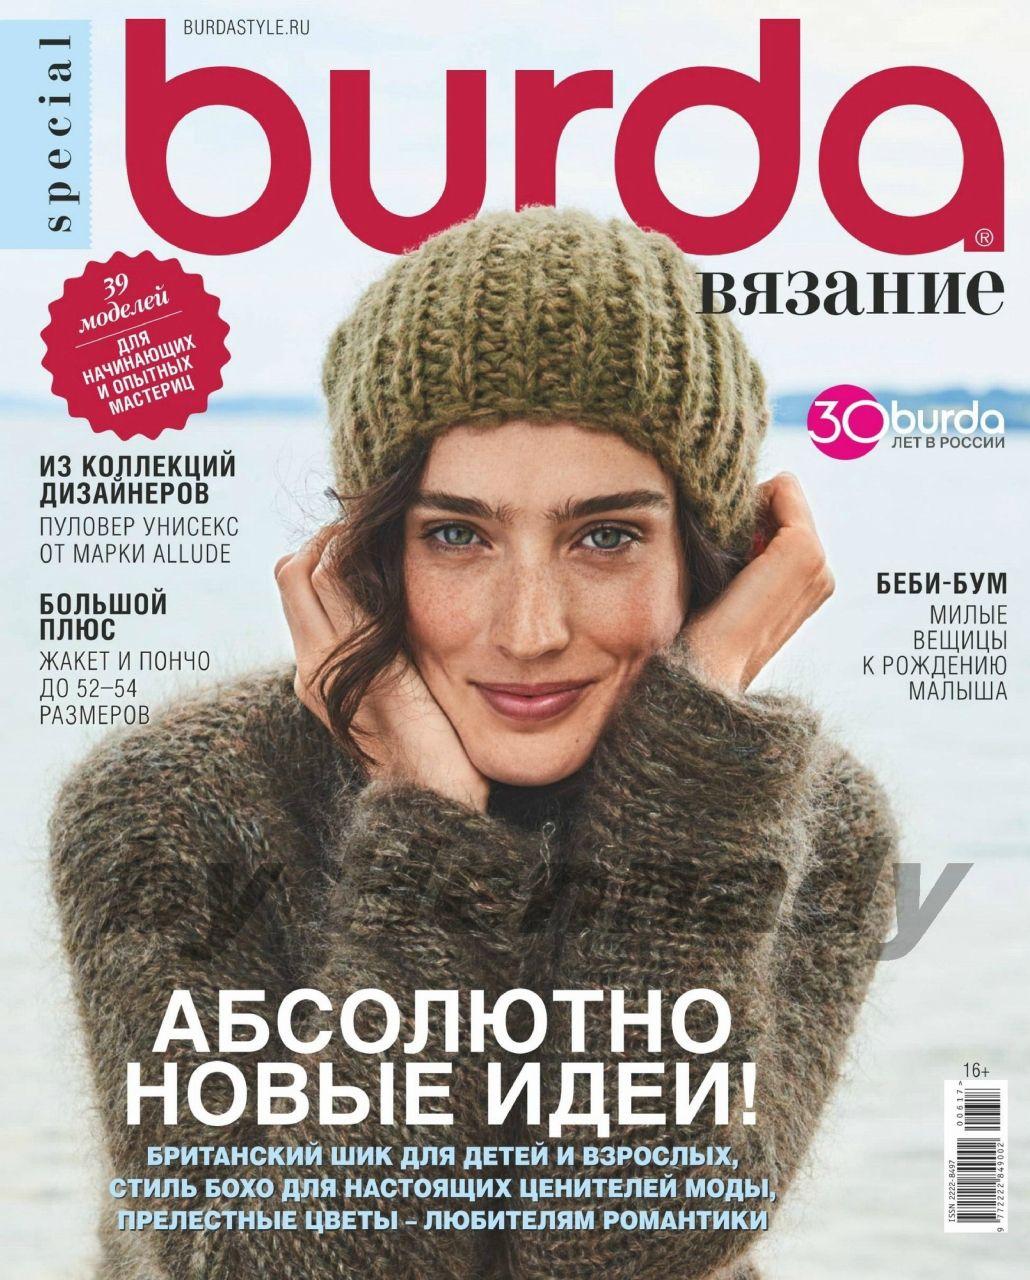 Burda special burda модное вязание дети